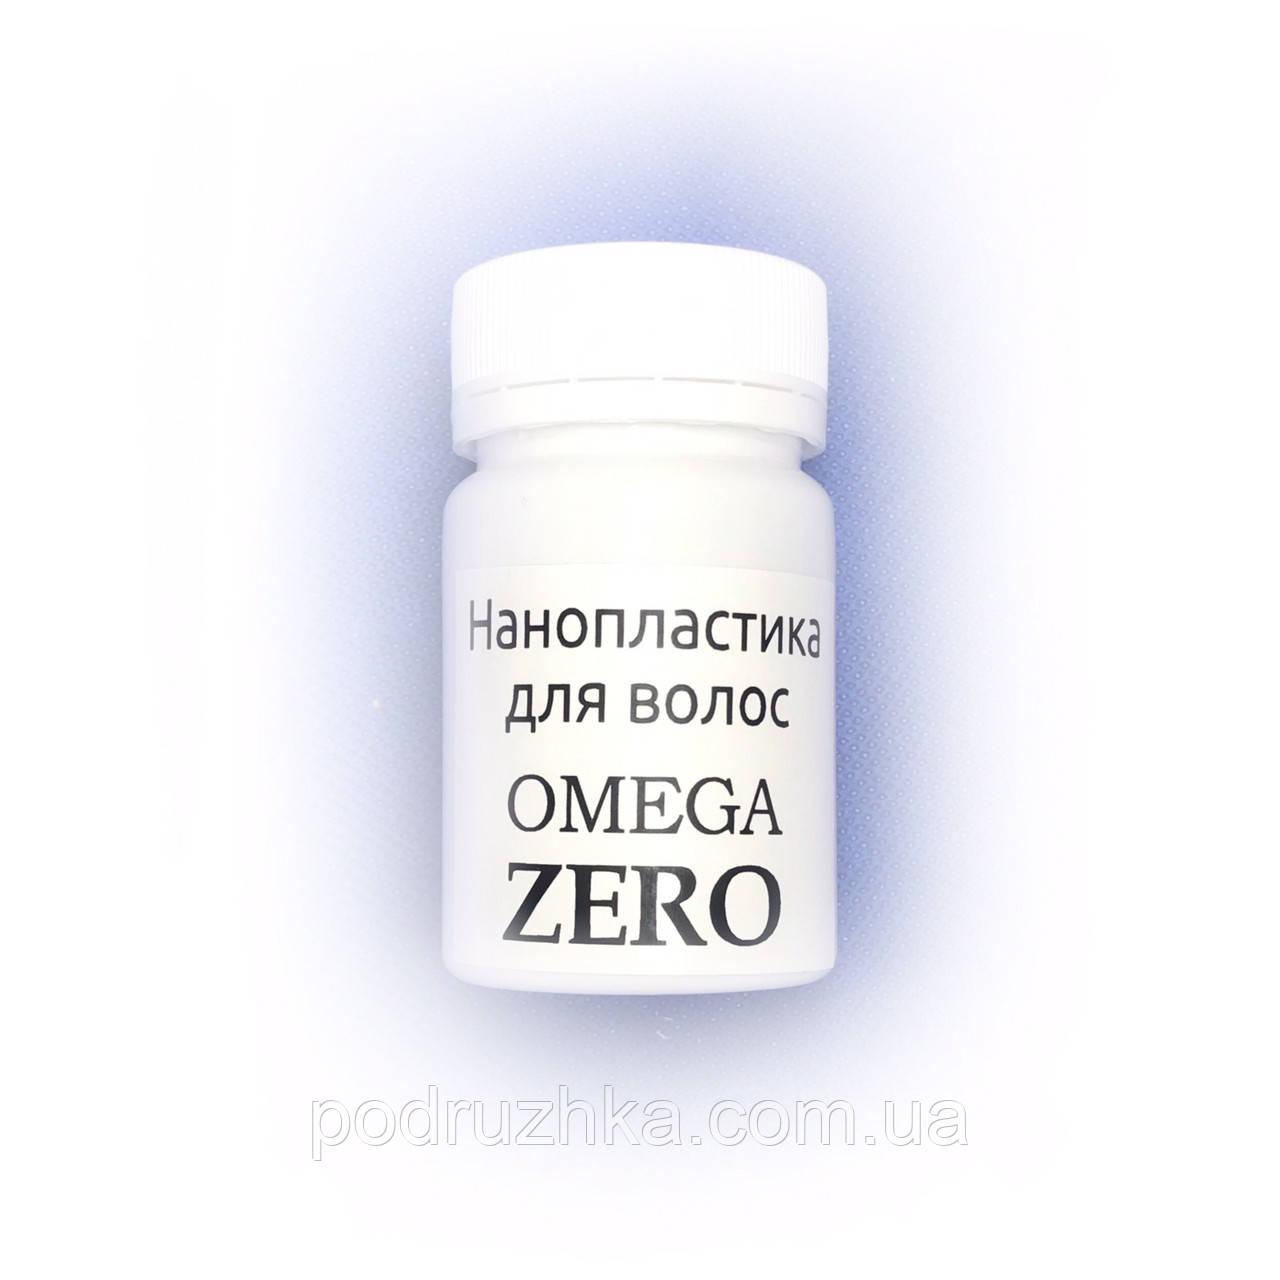 Нанопластика для волос Omega Zero Black Nanoplastia 50 г